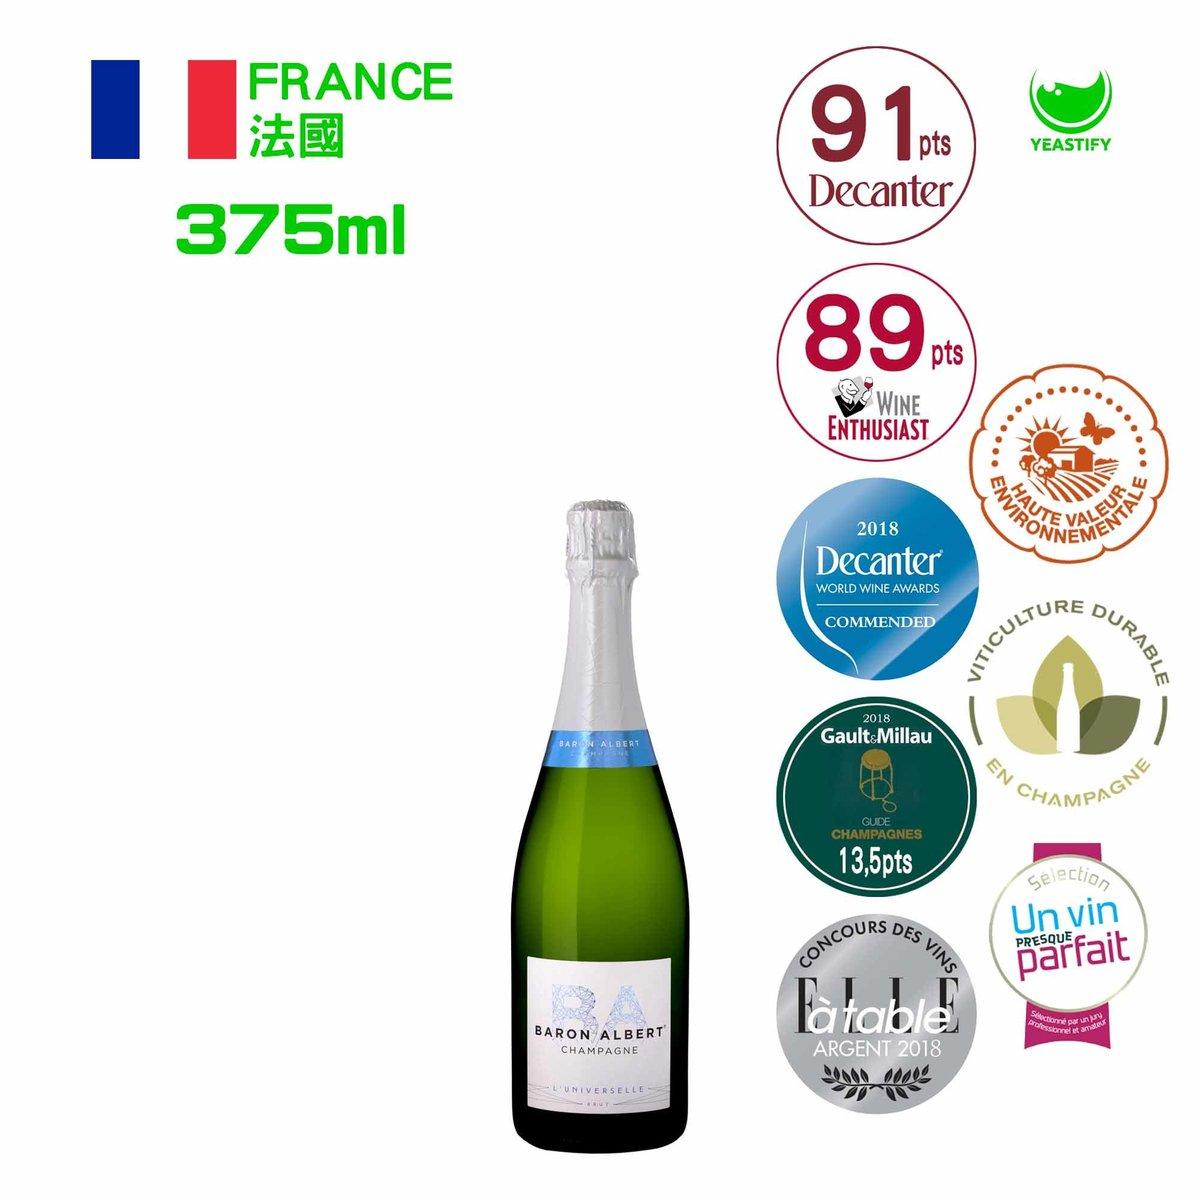 佰朗艾巴香檳 L'Universelle Brut 375ml